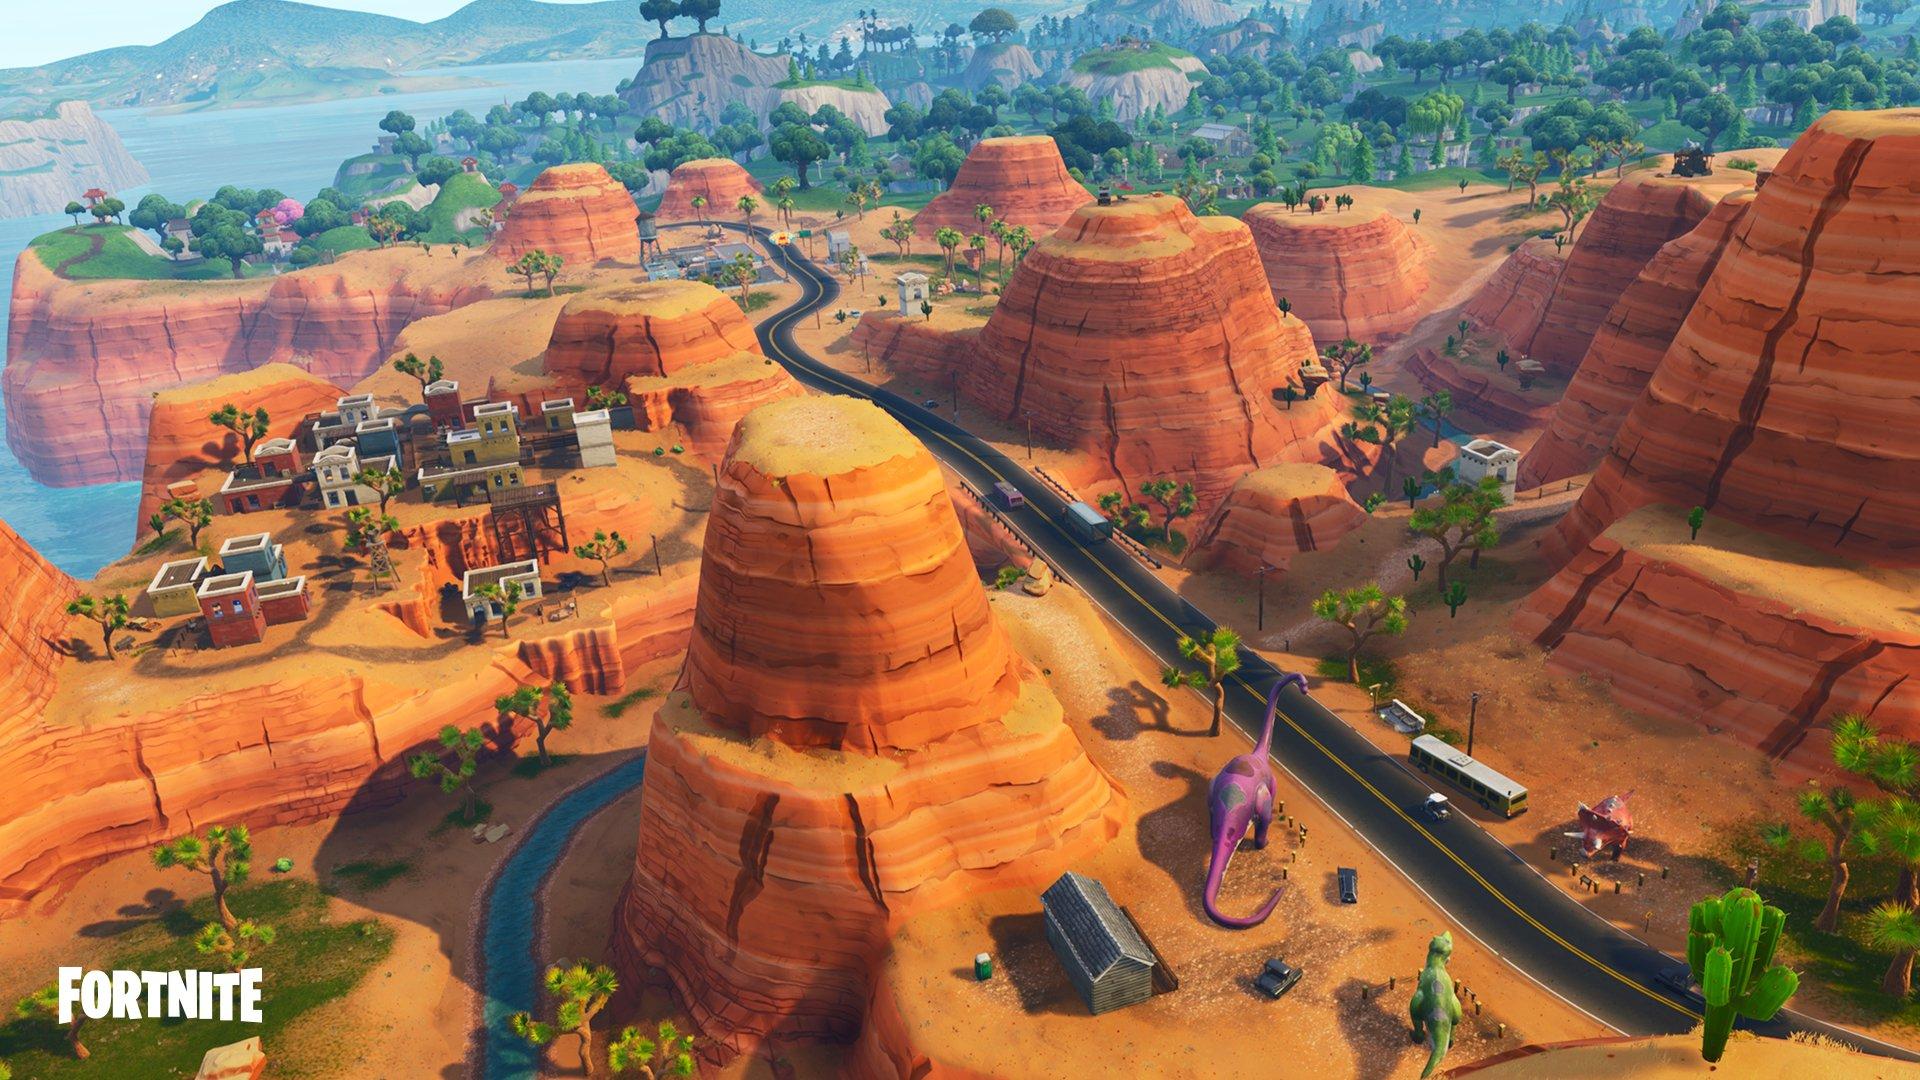 Free Download Fortnite Season 5 New Map Vs Season 4 Map Comparison Video 1920x1080 For Your Desktop Mobile Tablet Explore 31 Fortnite Map Wallpapers Fortnite Map Wallpapers Map Wallpapers Map Wallpaper